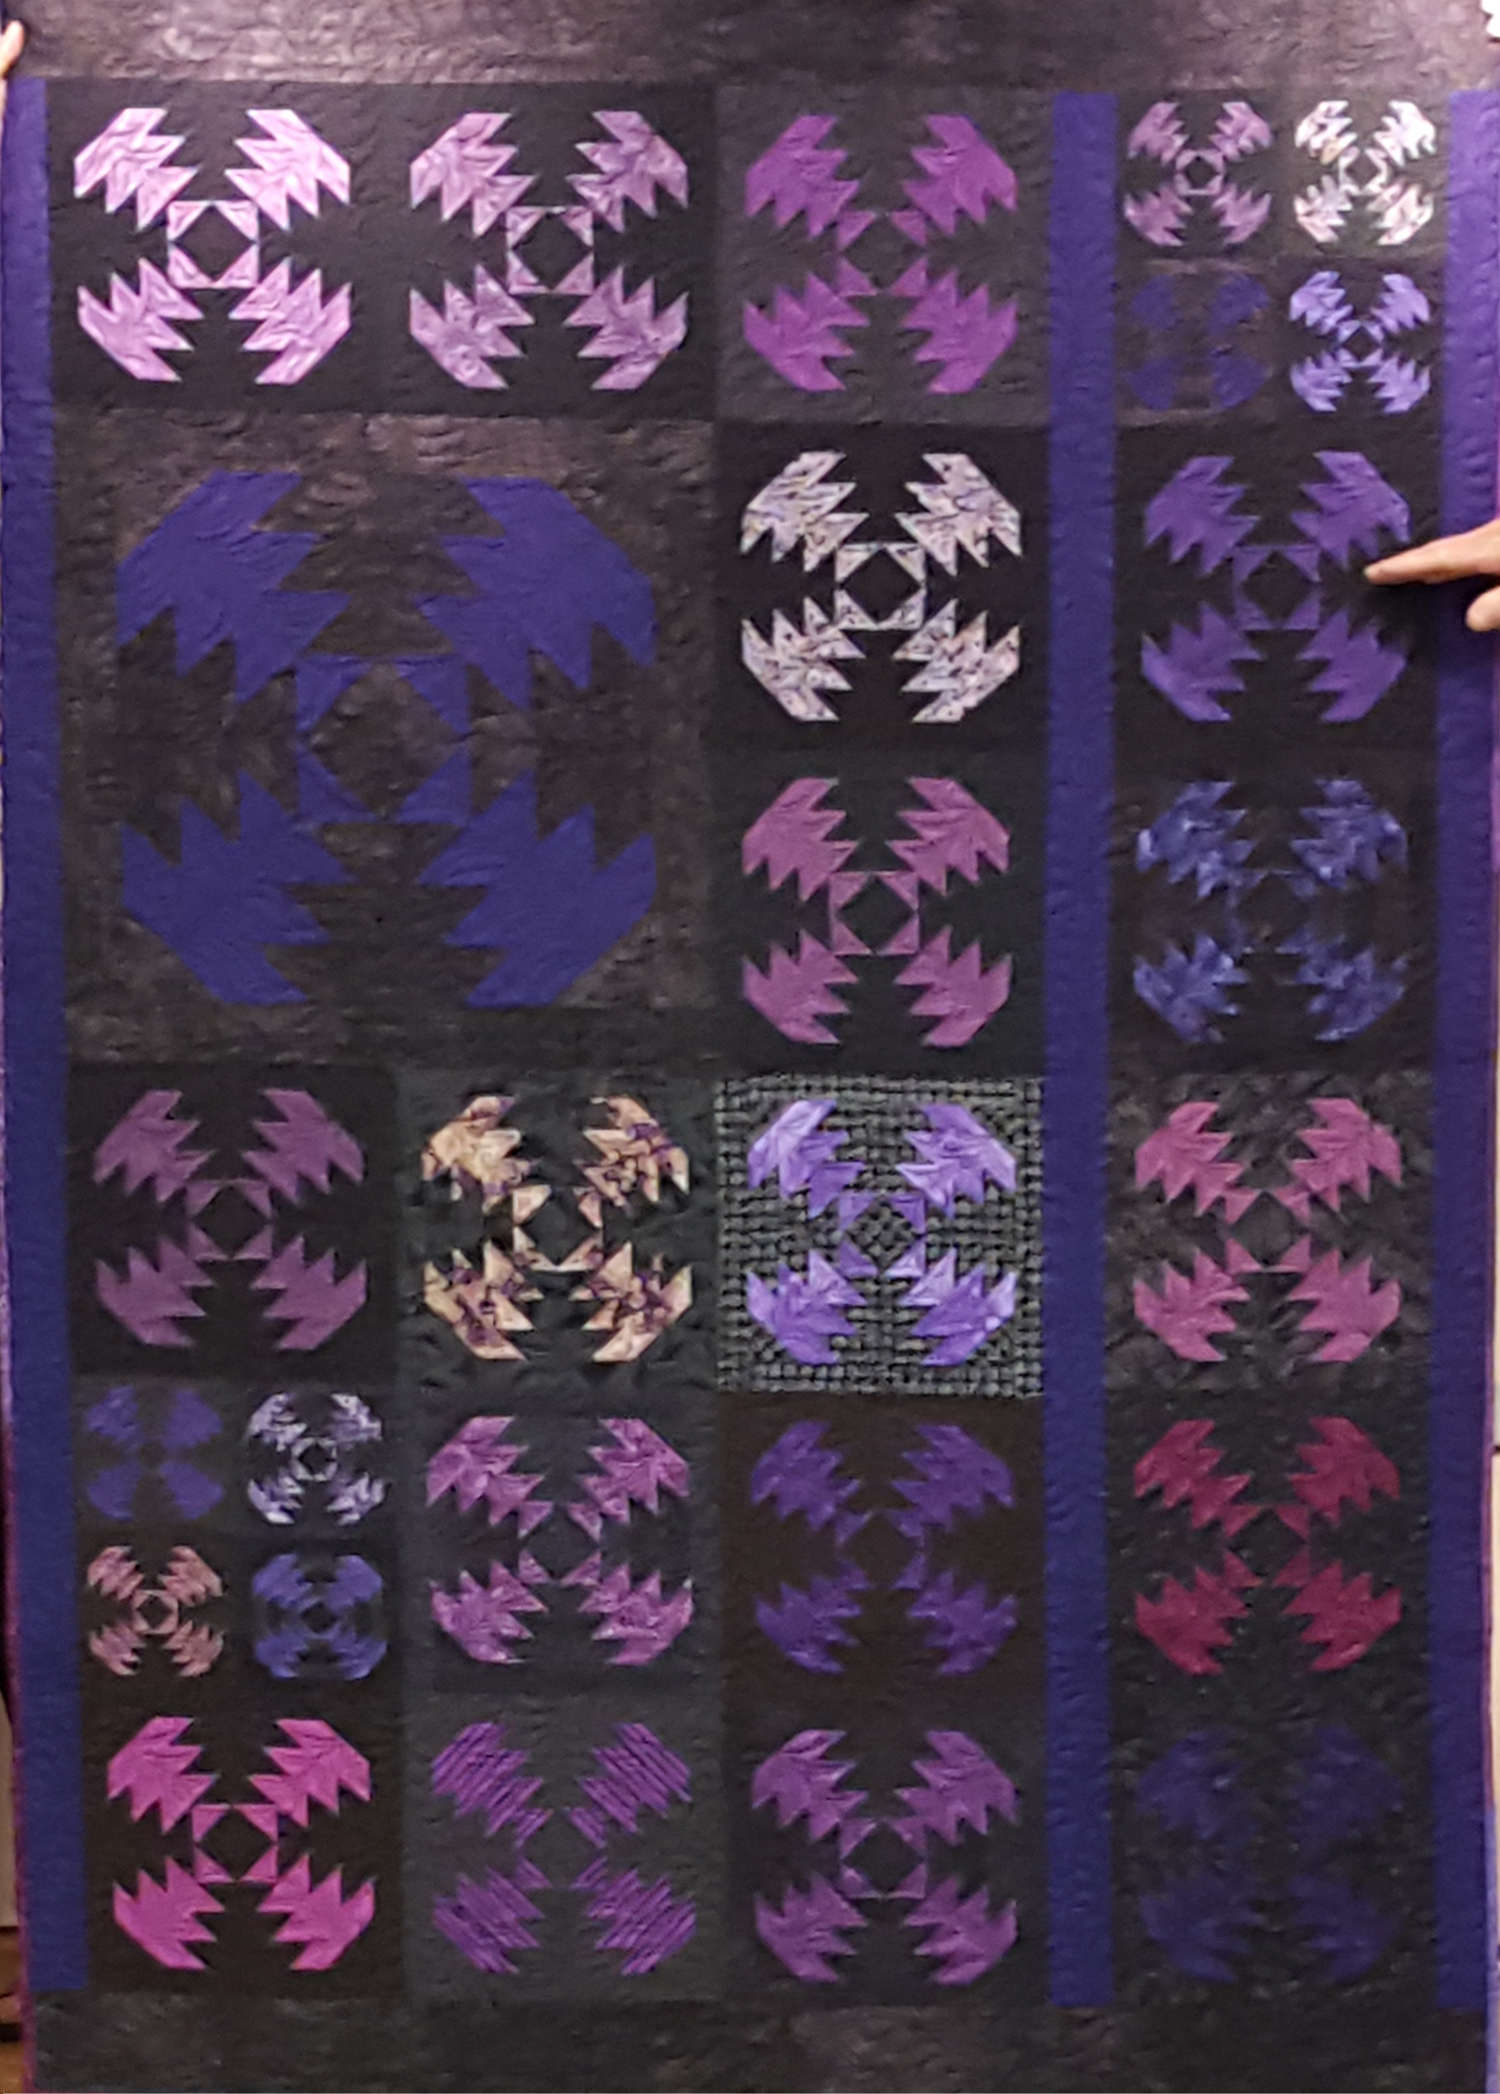 purple pineapples 3 sizes.jpg